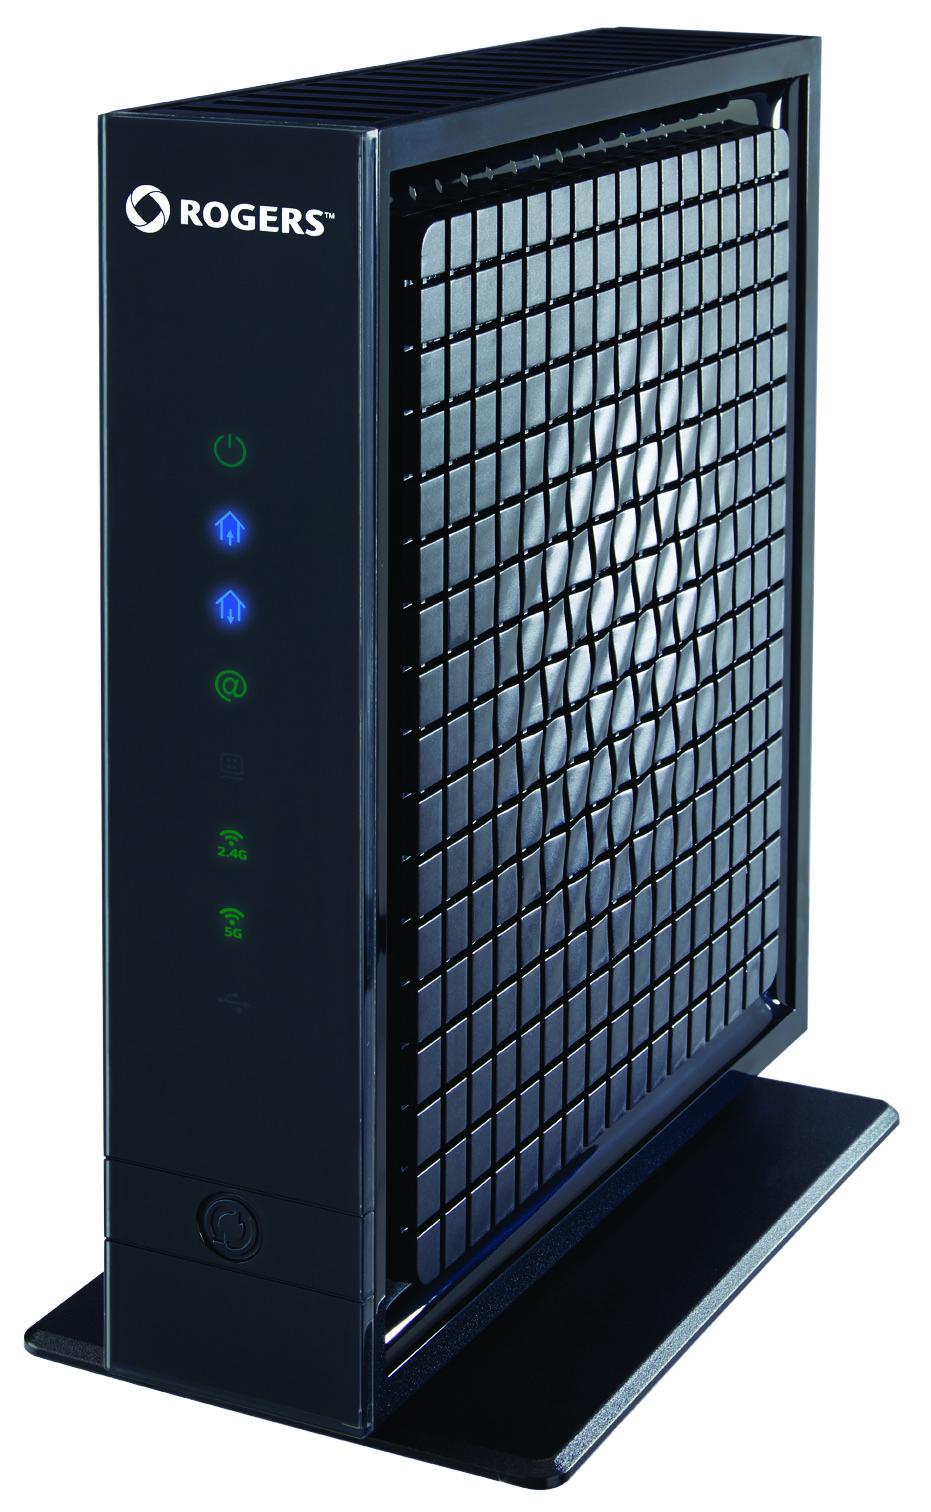 Rogers Adds New Wifi Modem Amp Several Lte Markets Digital